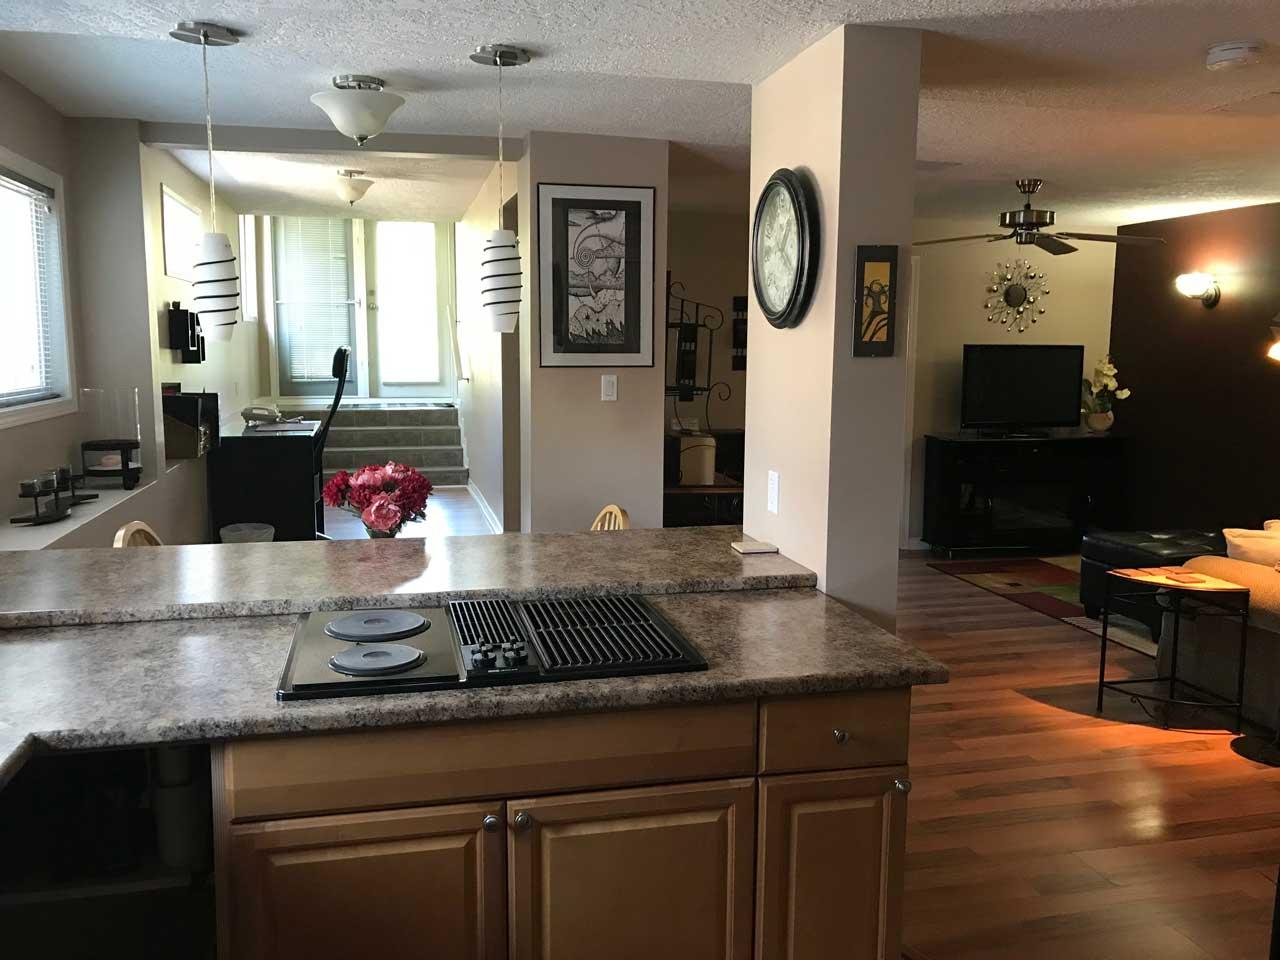 The Studio Suite Lakeview Rental homes Nanaimo, BC